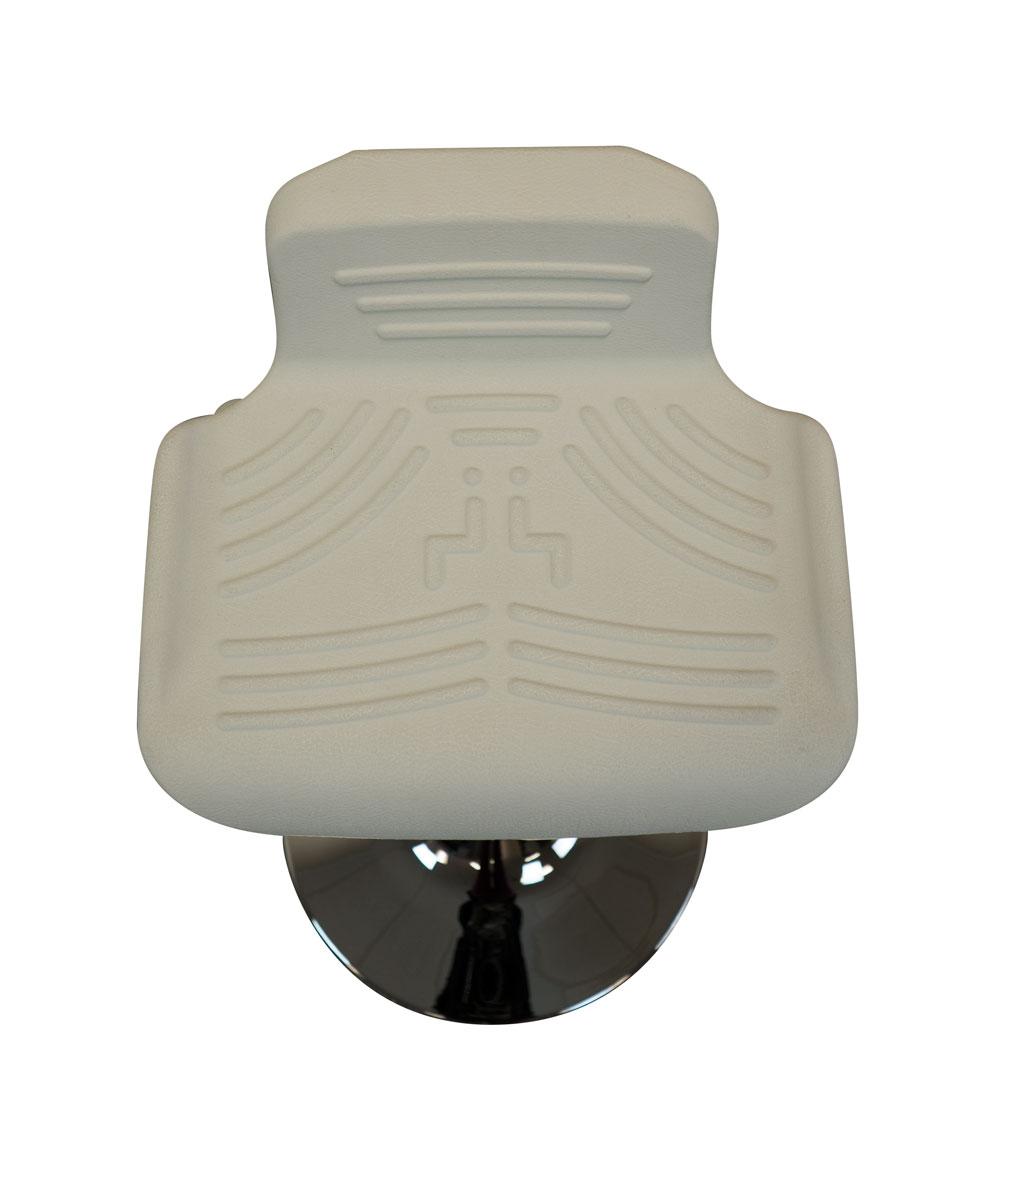 Tempo TreadTop™ Sit-Stand Stool Polyurethane Seat